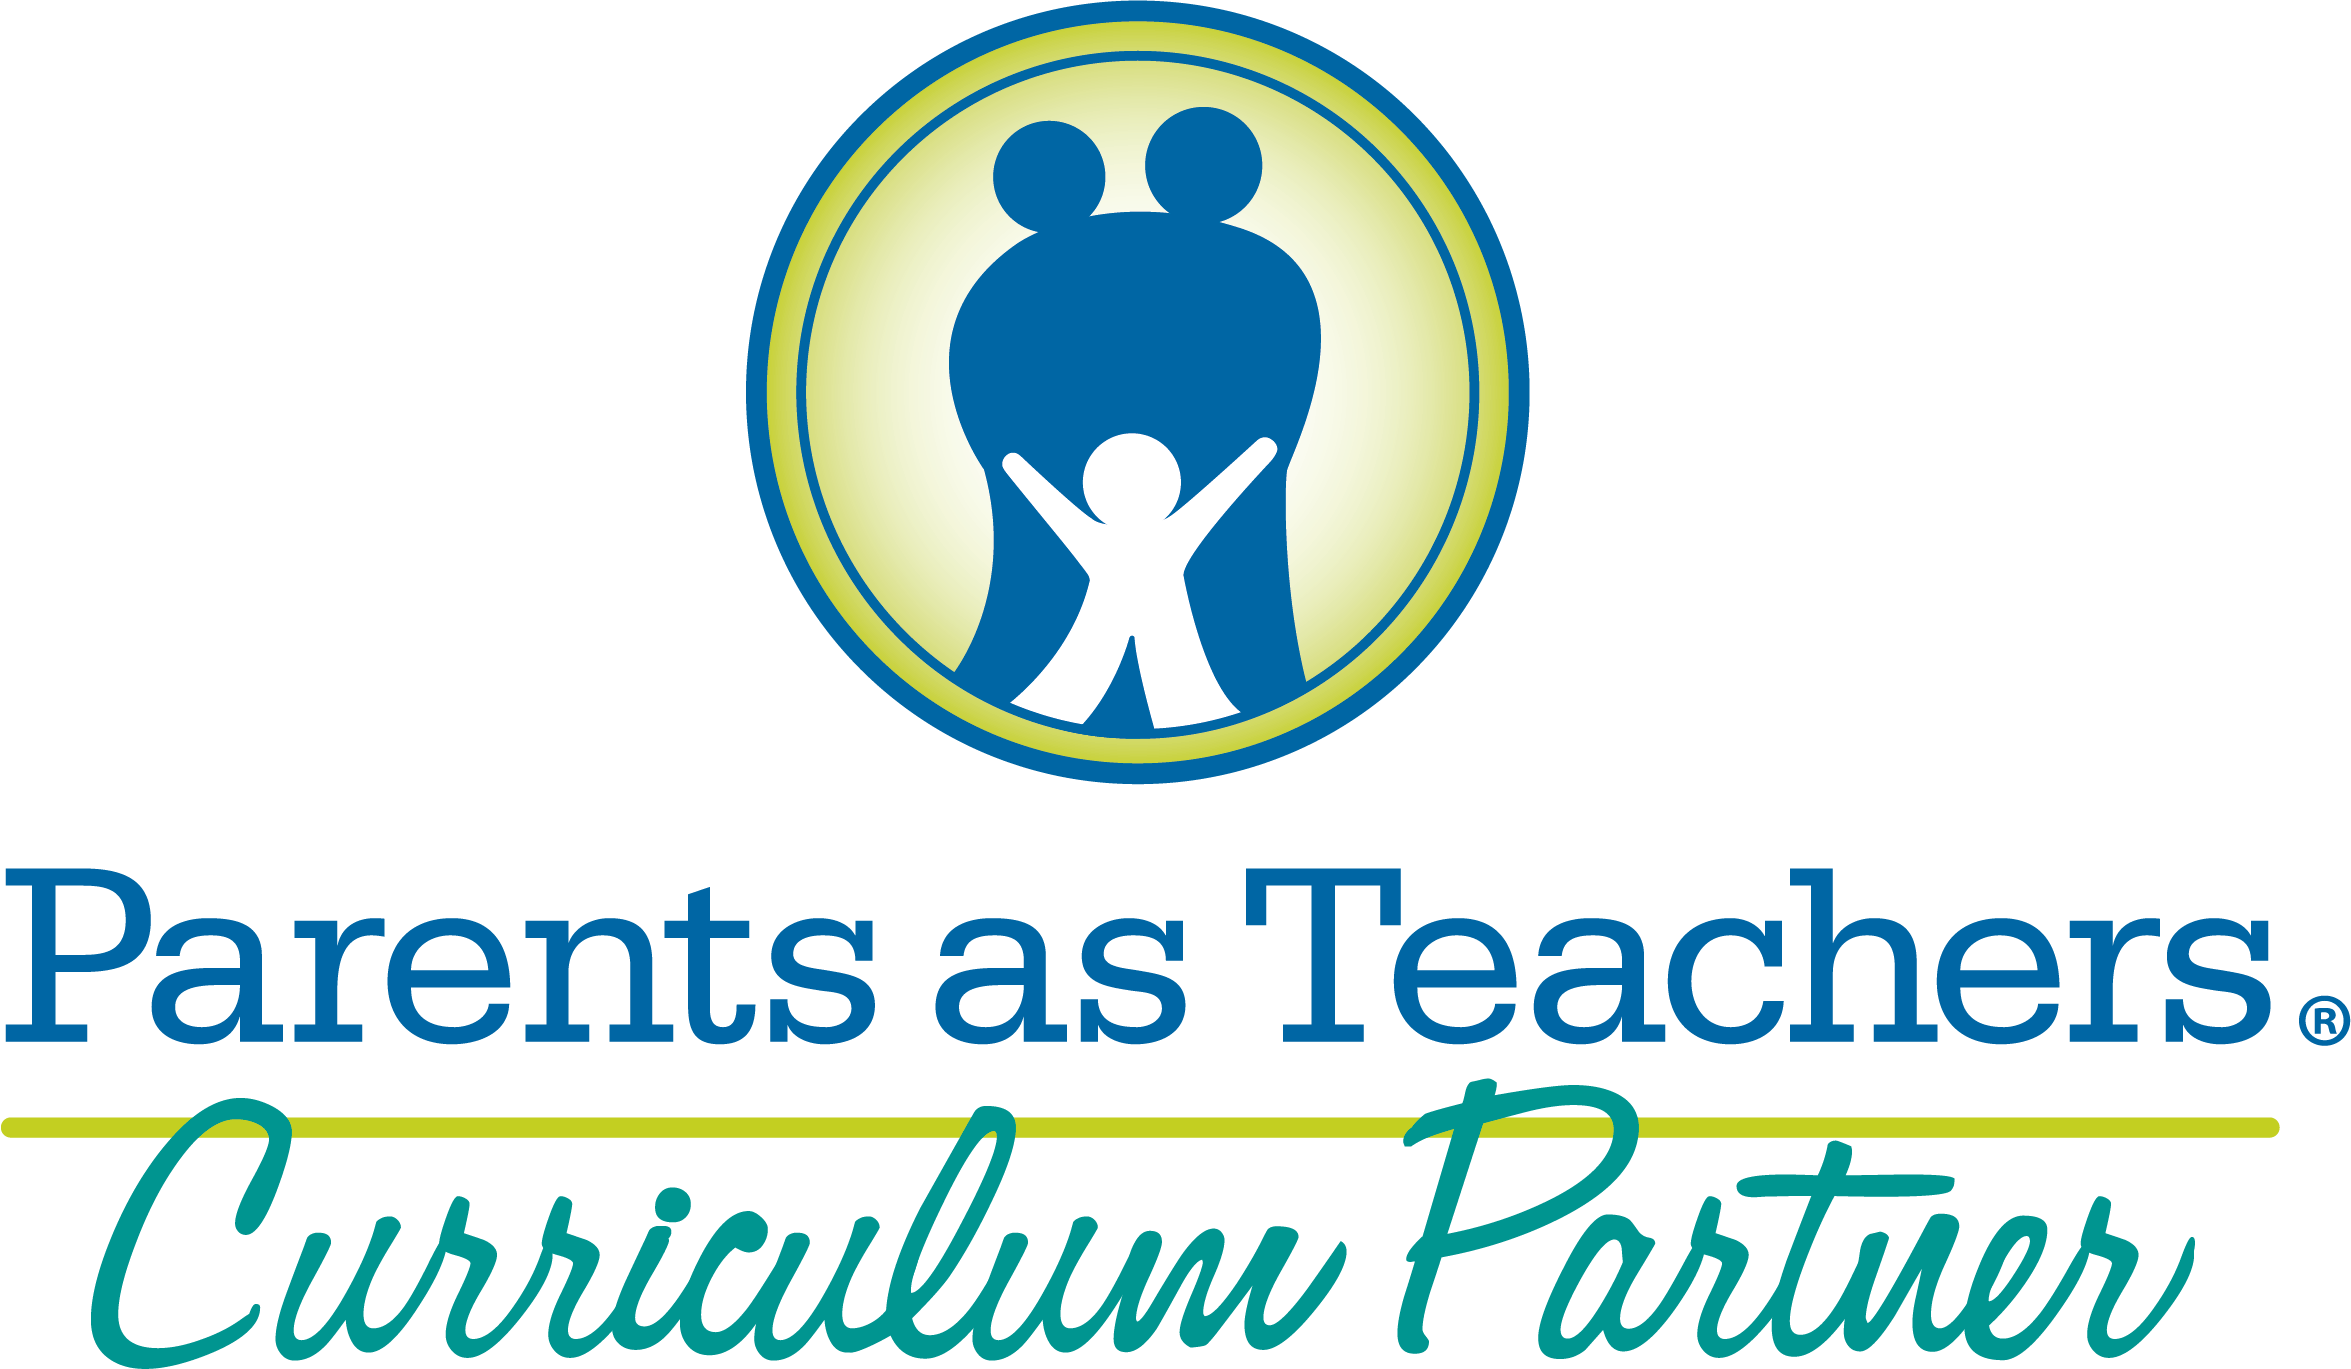 Parents as Teachers Curriculum Partner logo